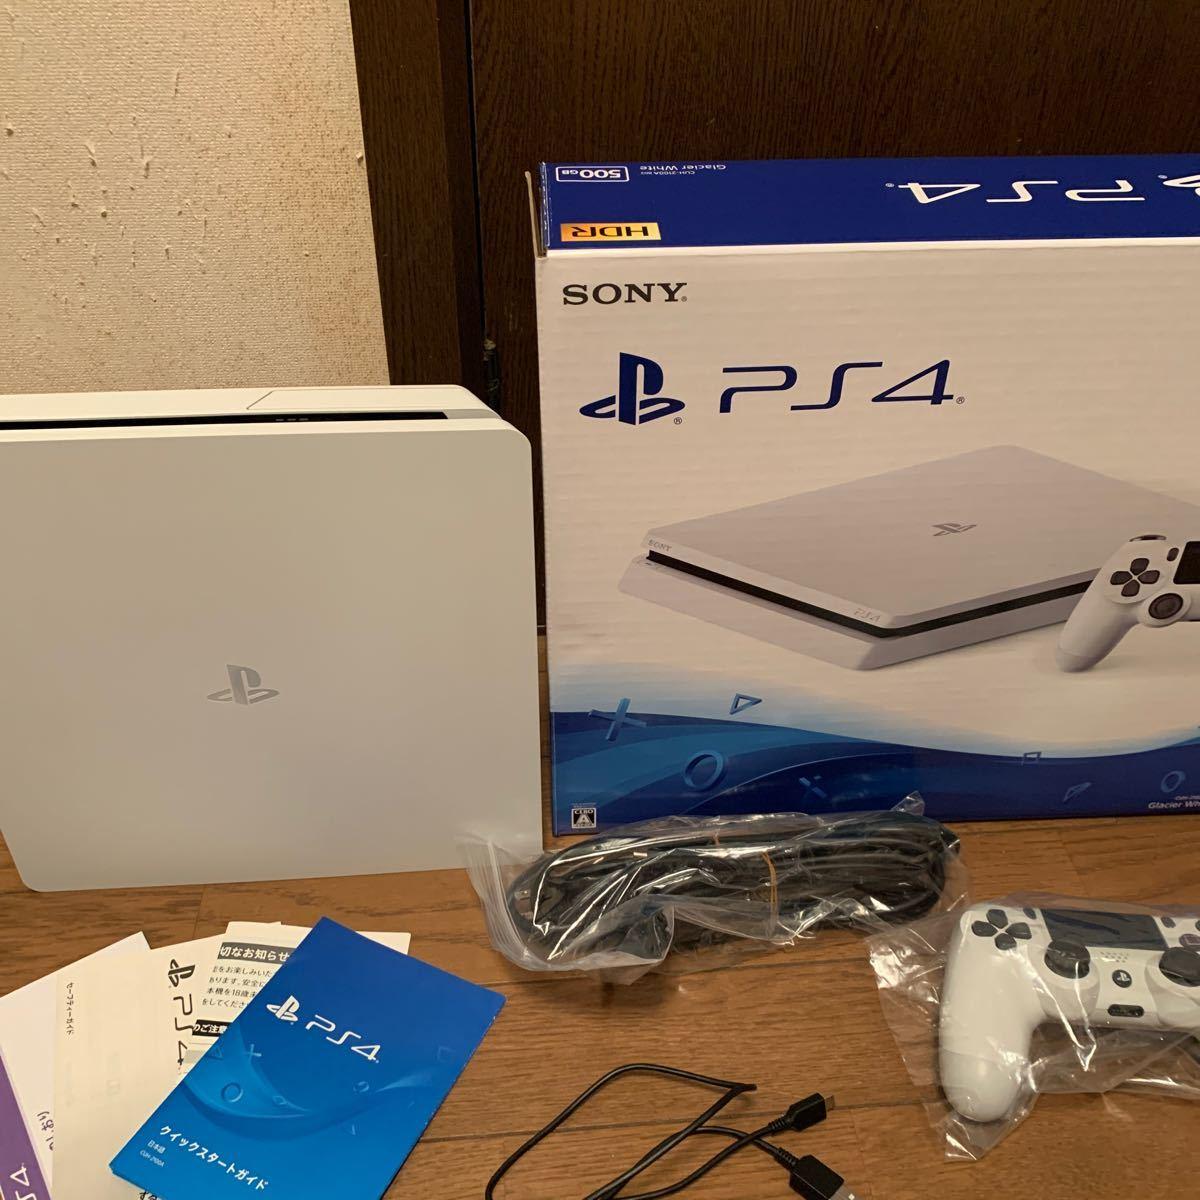 PlayStation4 グレイシャー・ホワイト 500GB CUH-2000AB02